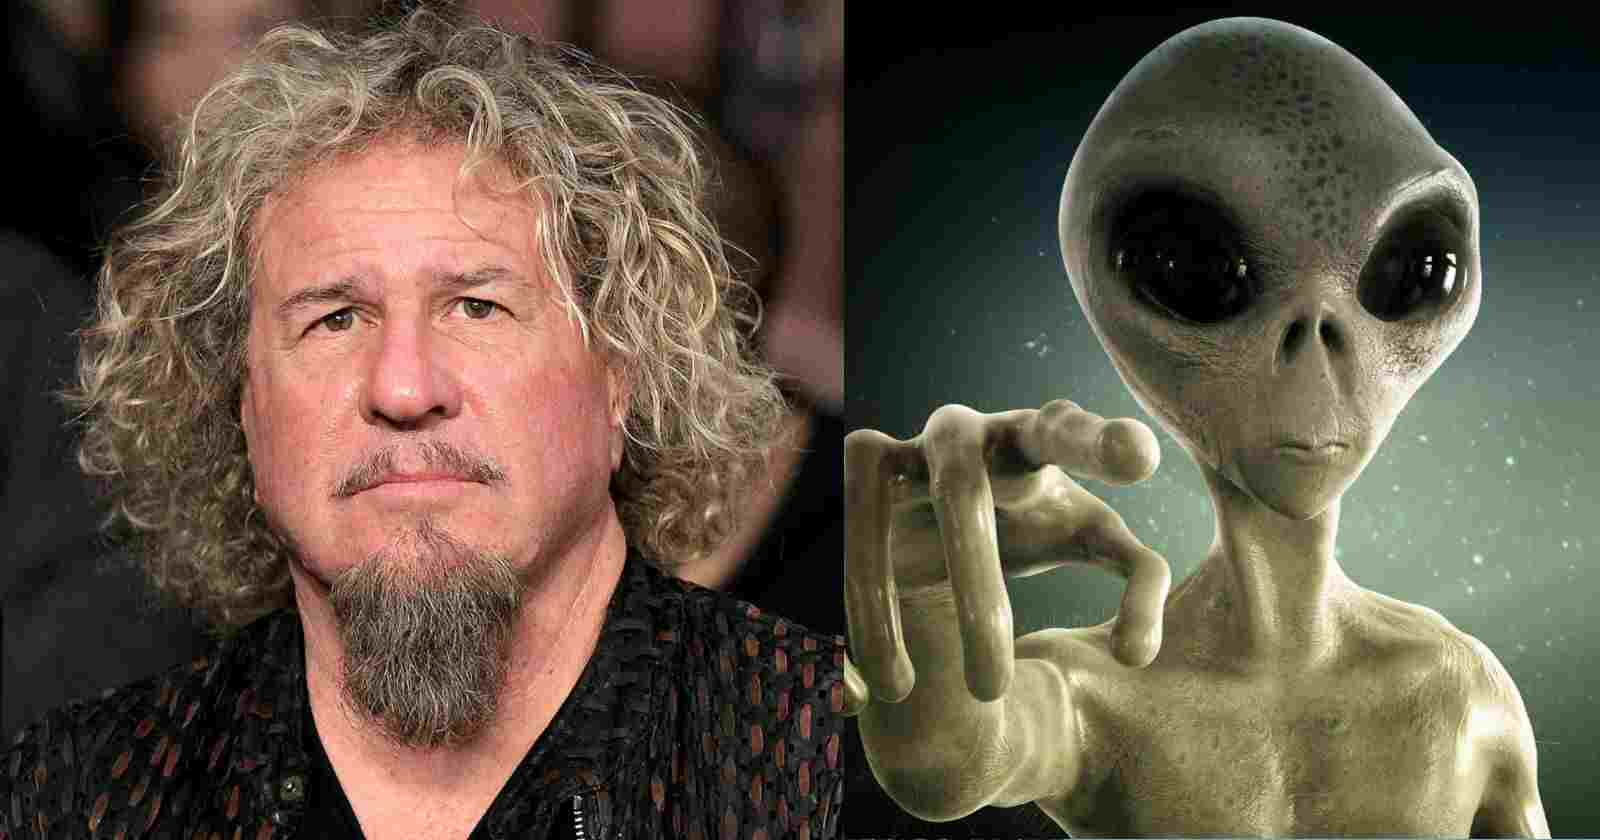 Sammy Hagar Alien